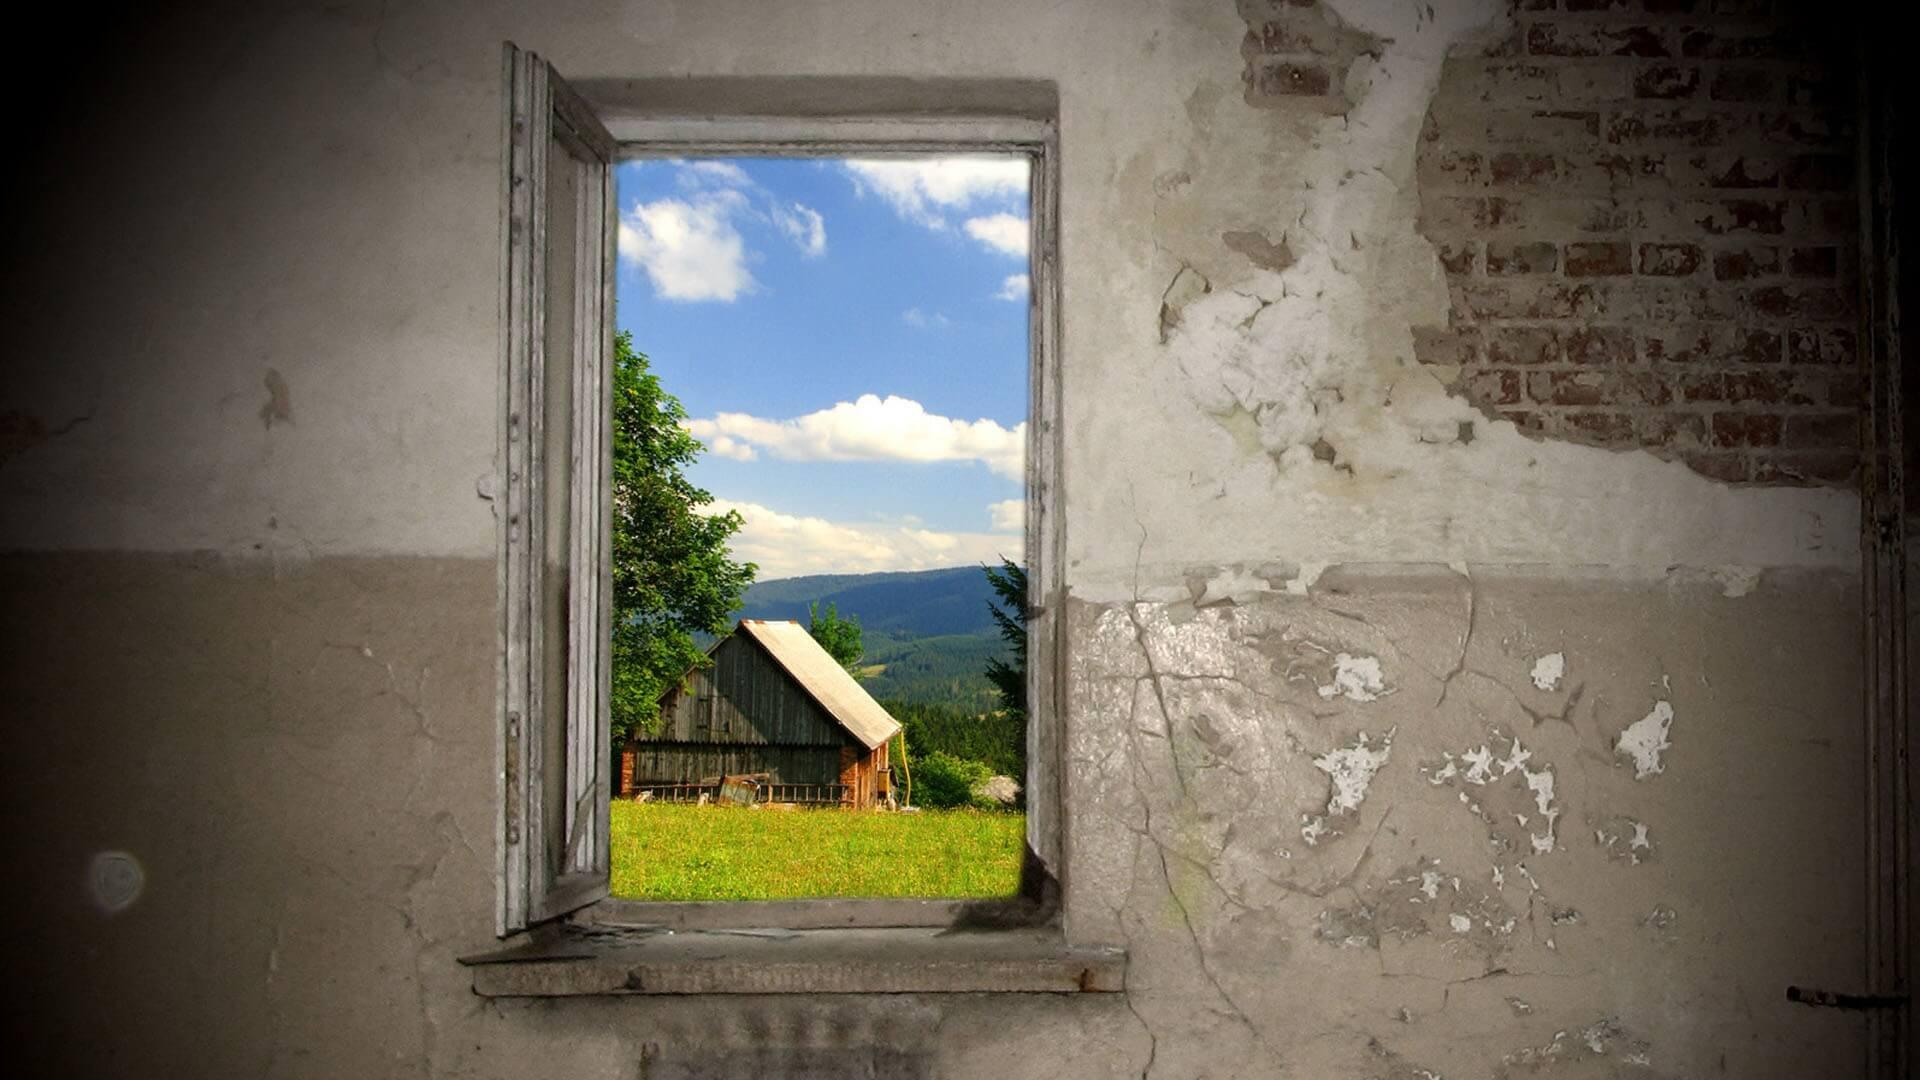 Petites fenêtres